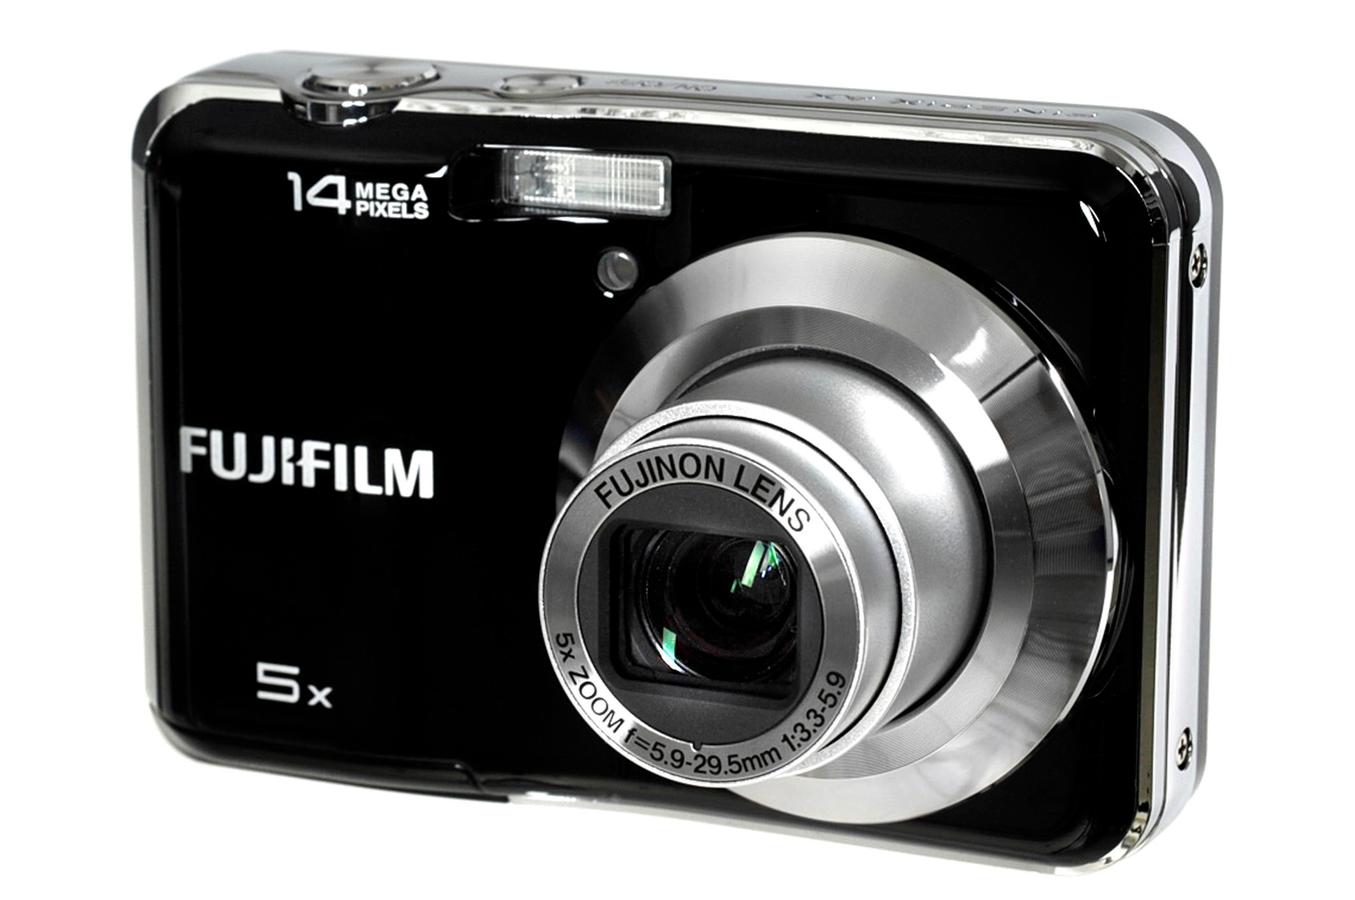 appareil photo compact fujifilm ax 300 noir darty. Black Bedroom Furniture Sets. Home Design Ideas